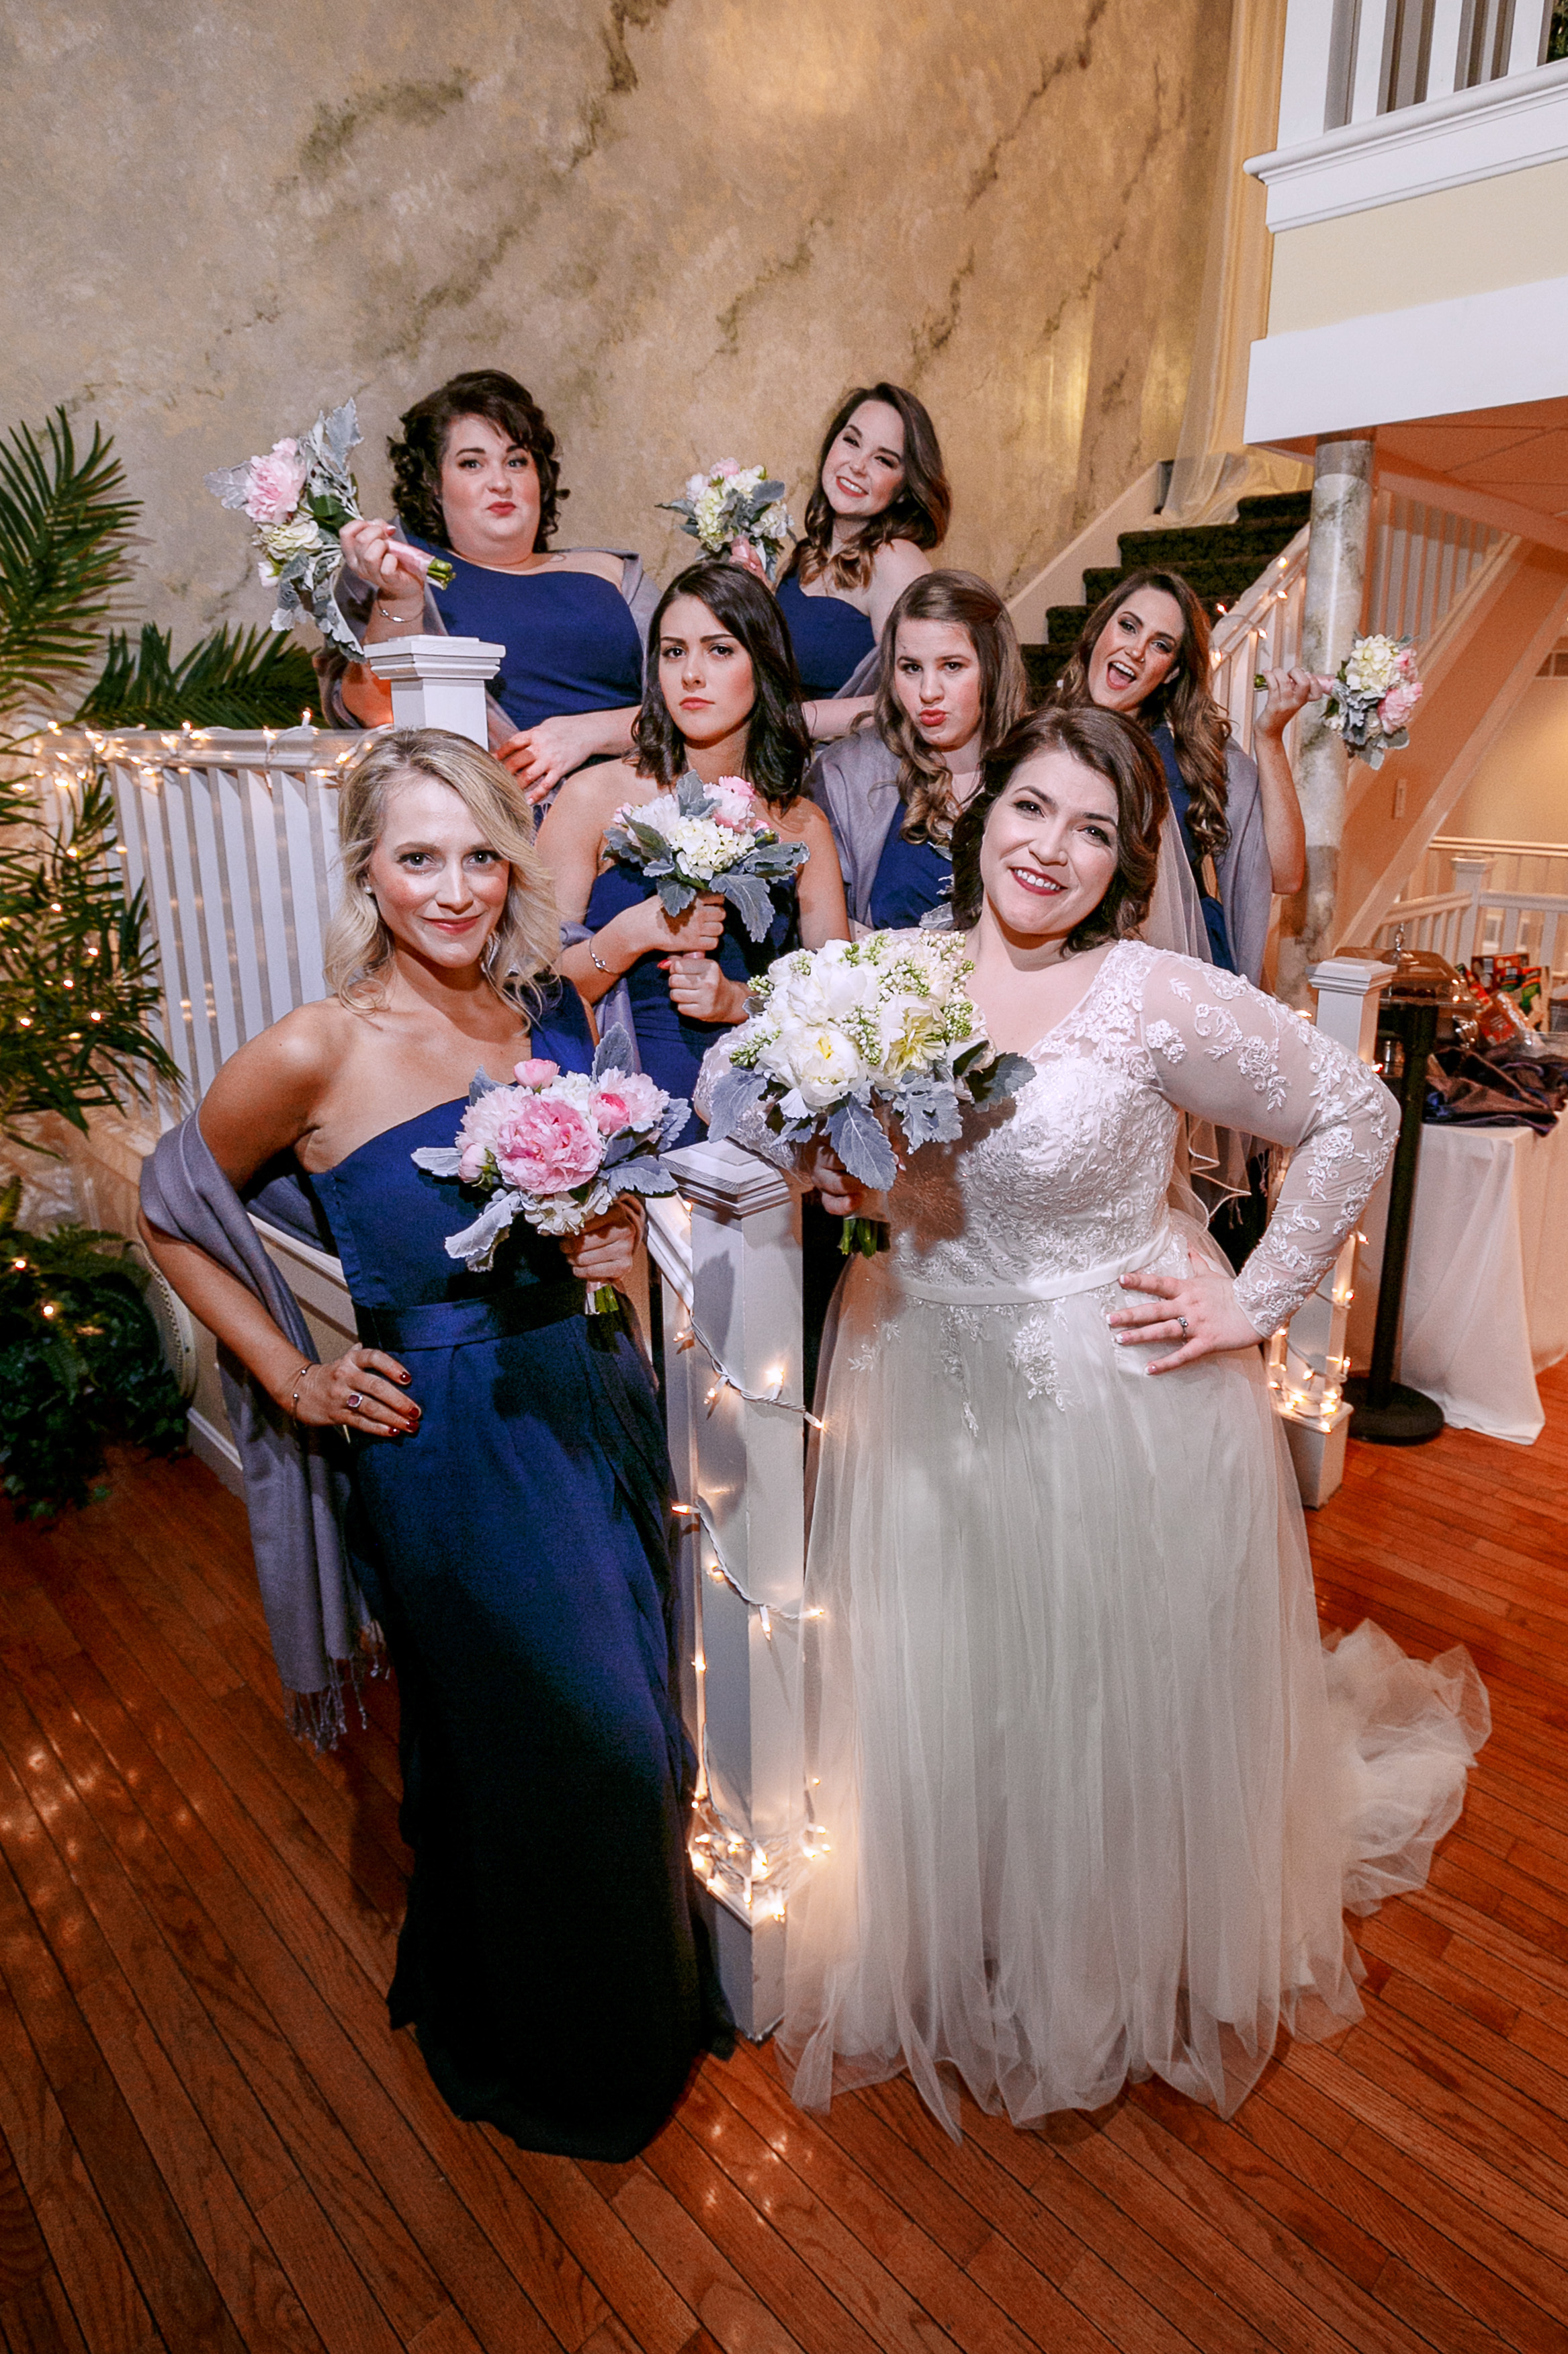 wedding photography, wedding photographer, Louisville wedding photography, Louisville, New Albany, Jeffersonville, Clarksville, professional photographer, photojournalism, full day wedding photography, 300 Spring